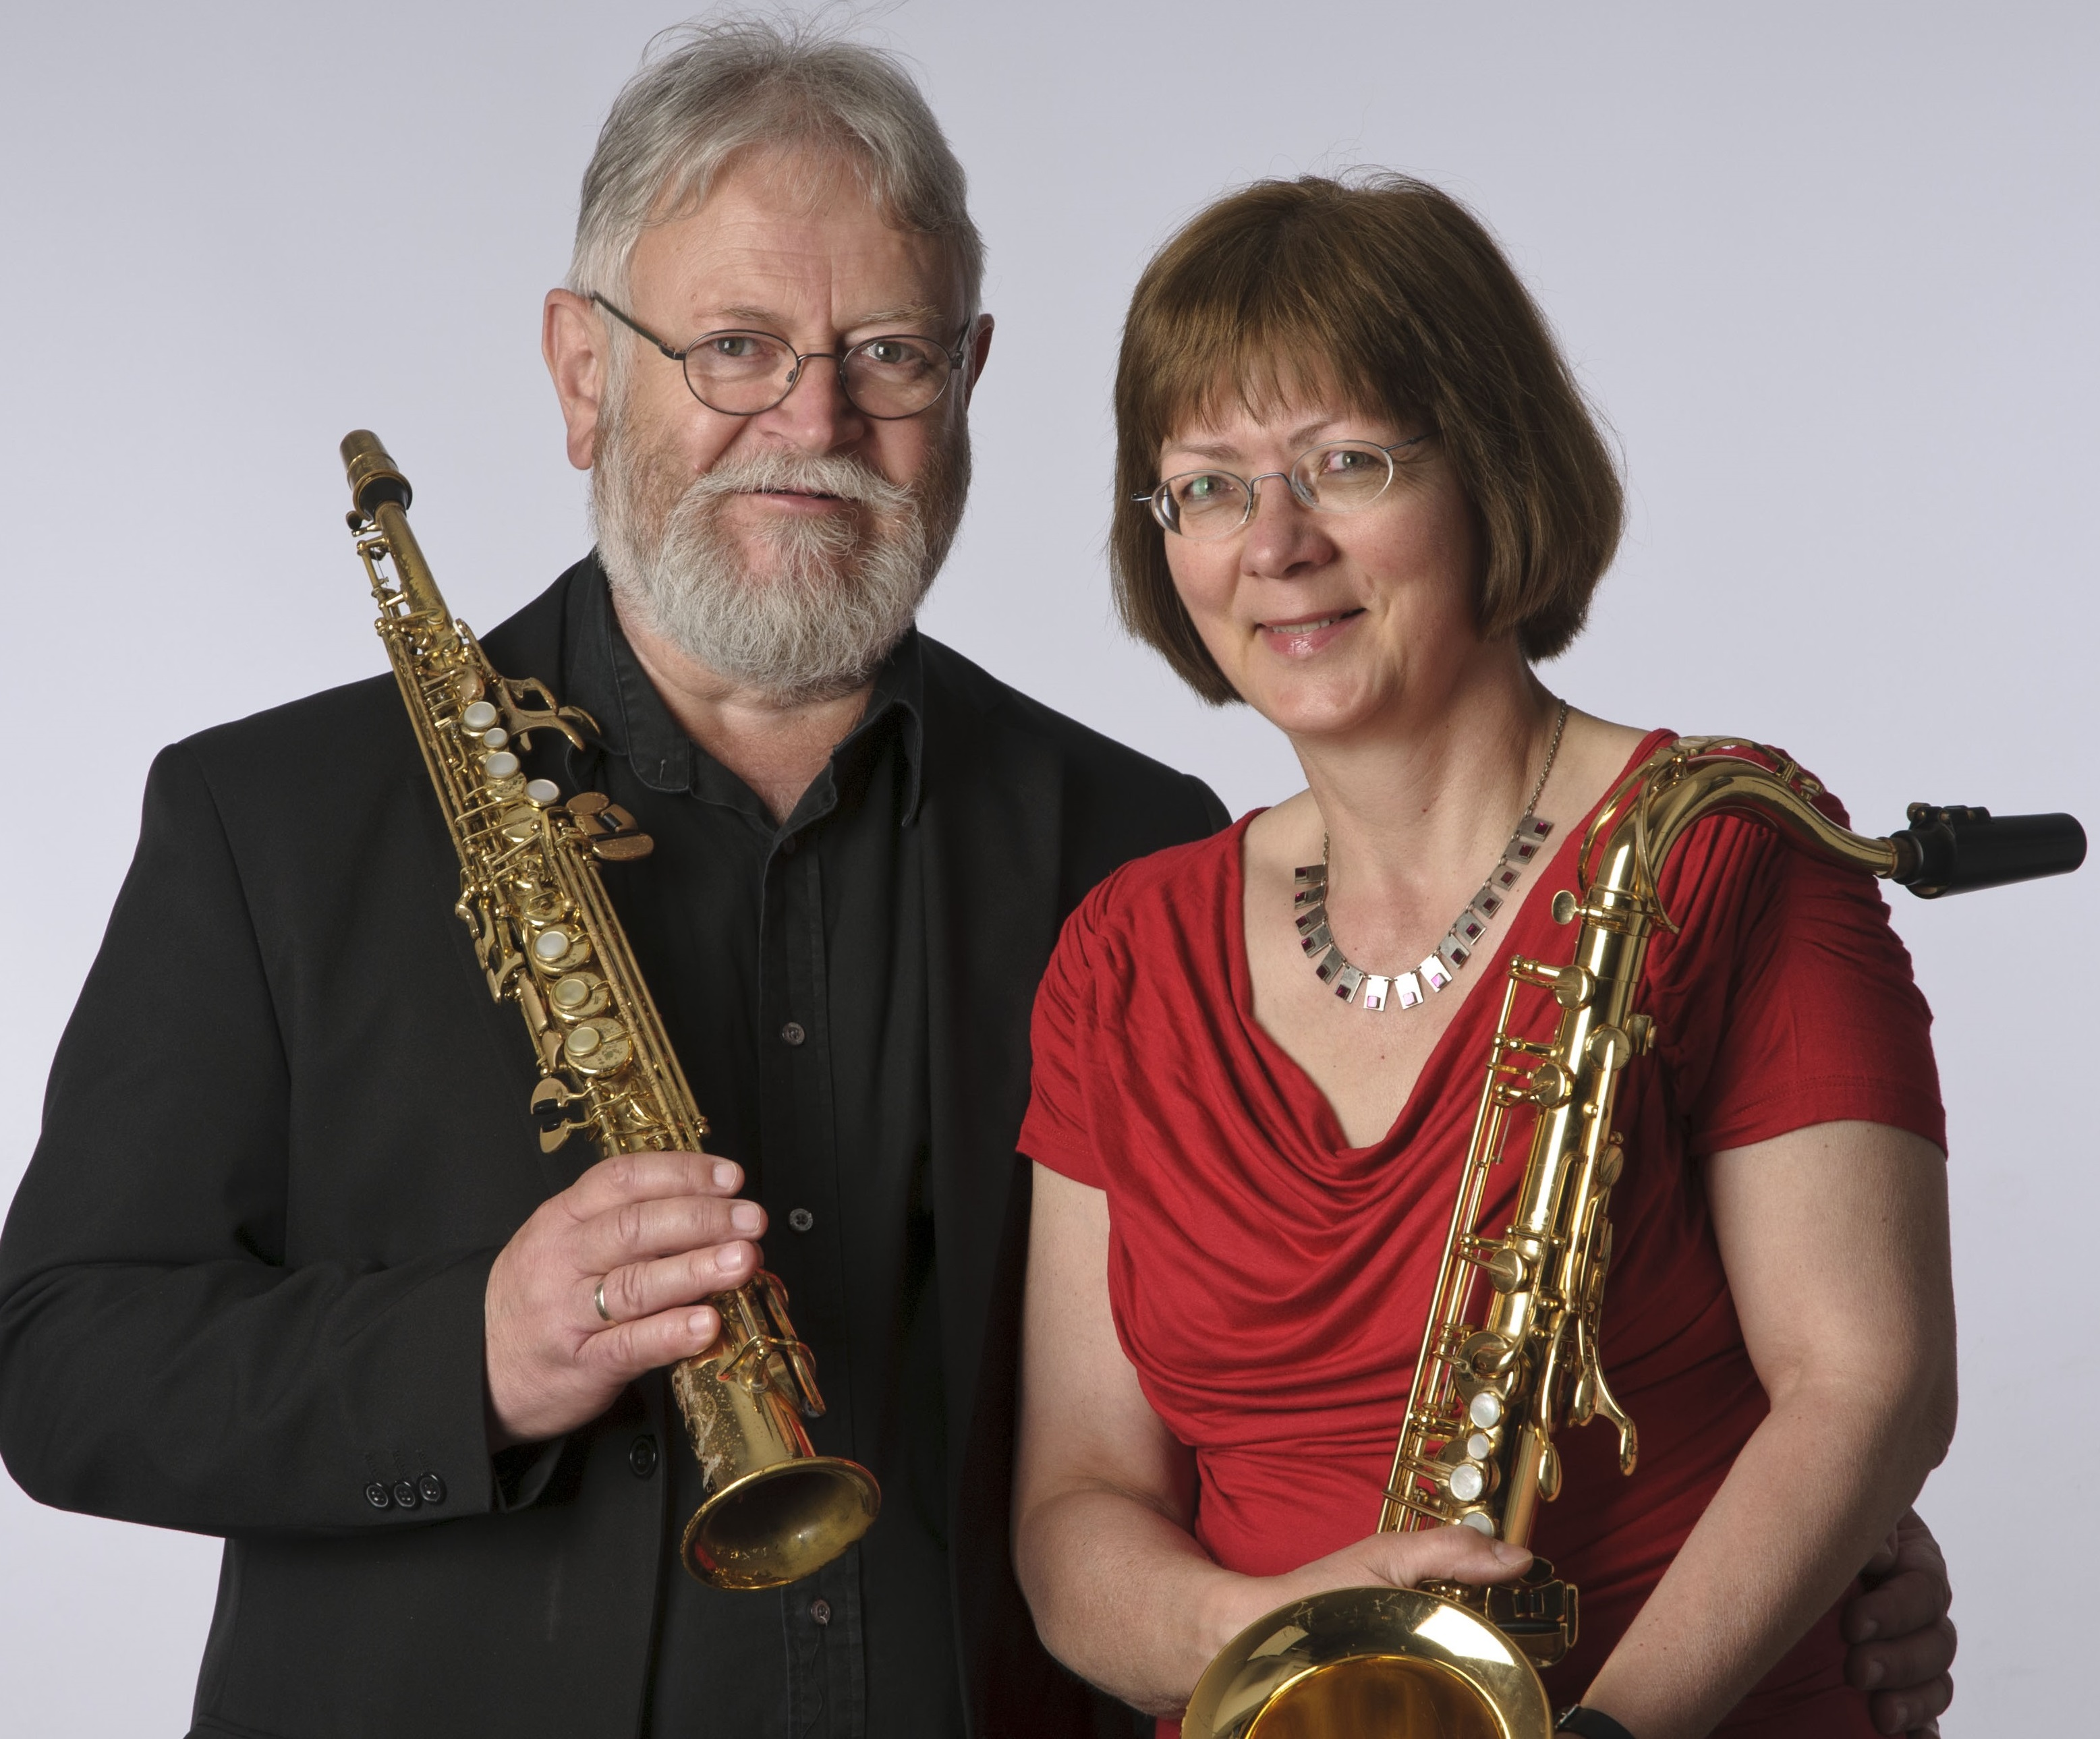 saxophon br ckner leipzig sachsen musikevents saxophon duo b. Black Bedroom Furniture Sets. Home Design Ideas